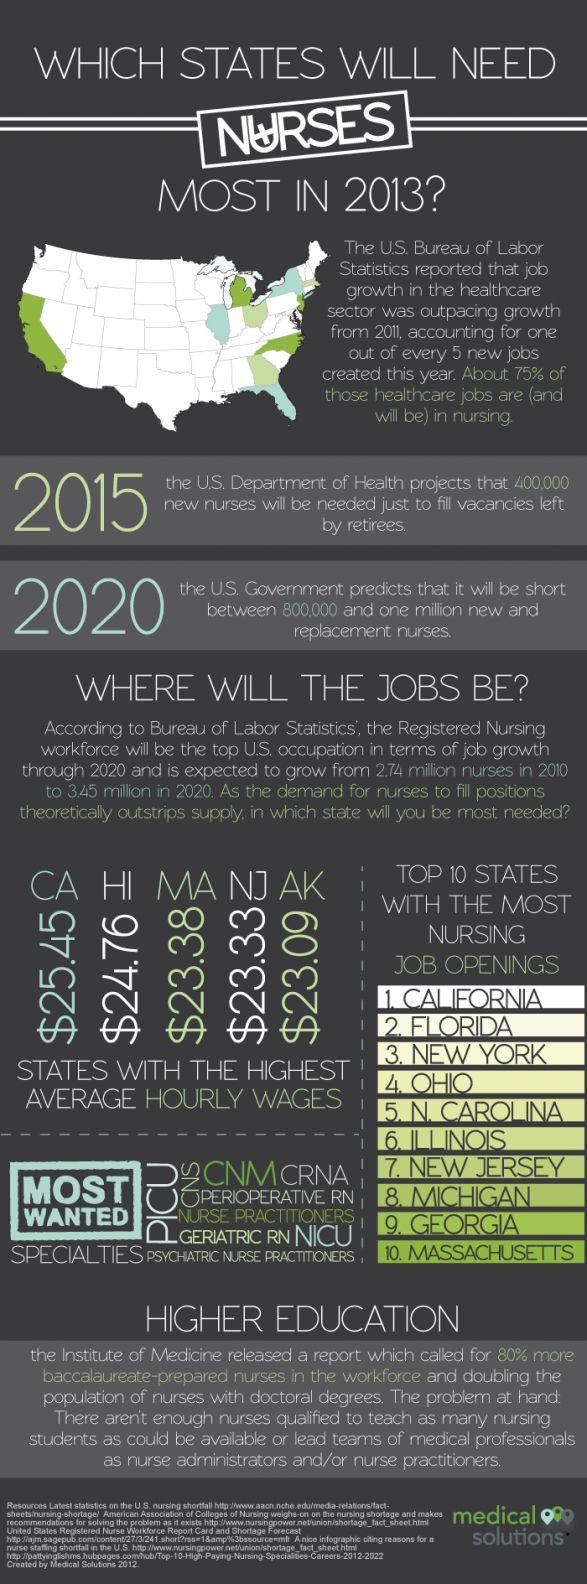 looks like moving to florida just might work2013 nursing job projections - Nicu Travel Nursing